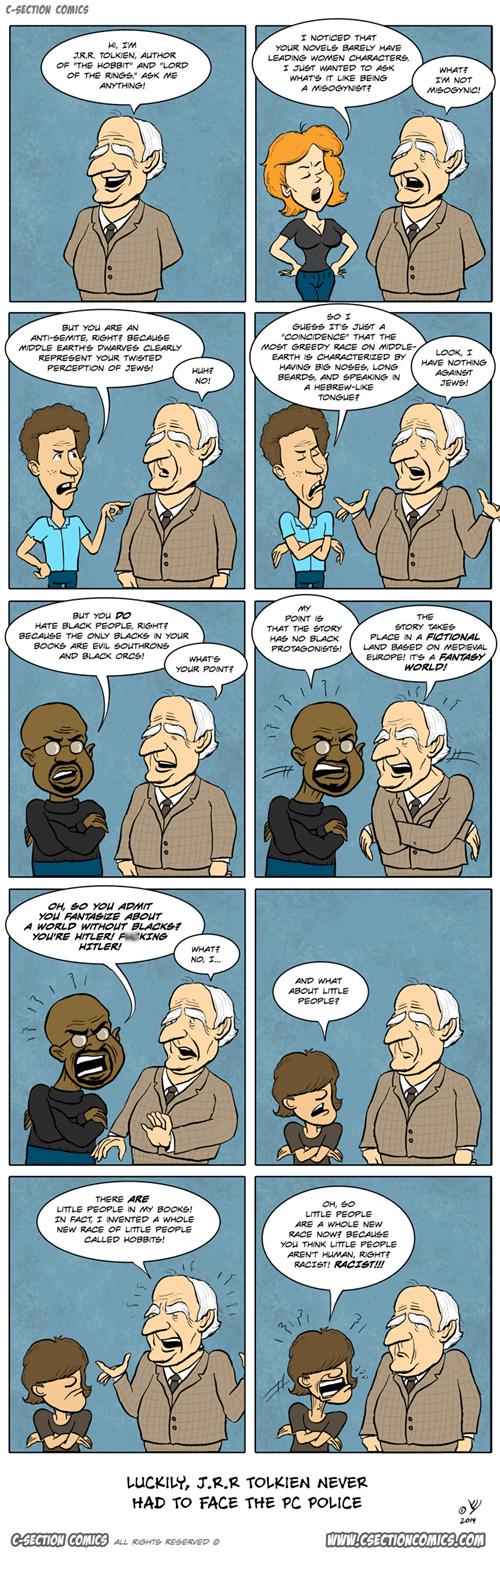 racism Lord of the Rings Sad web comics - 8237940224